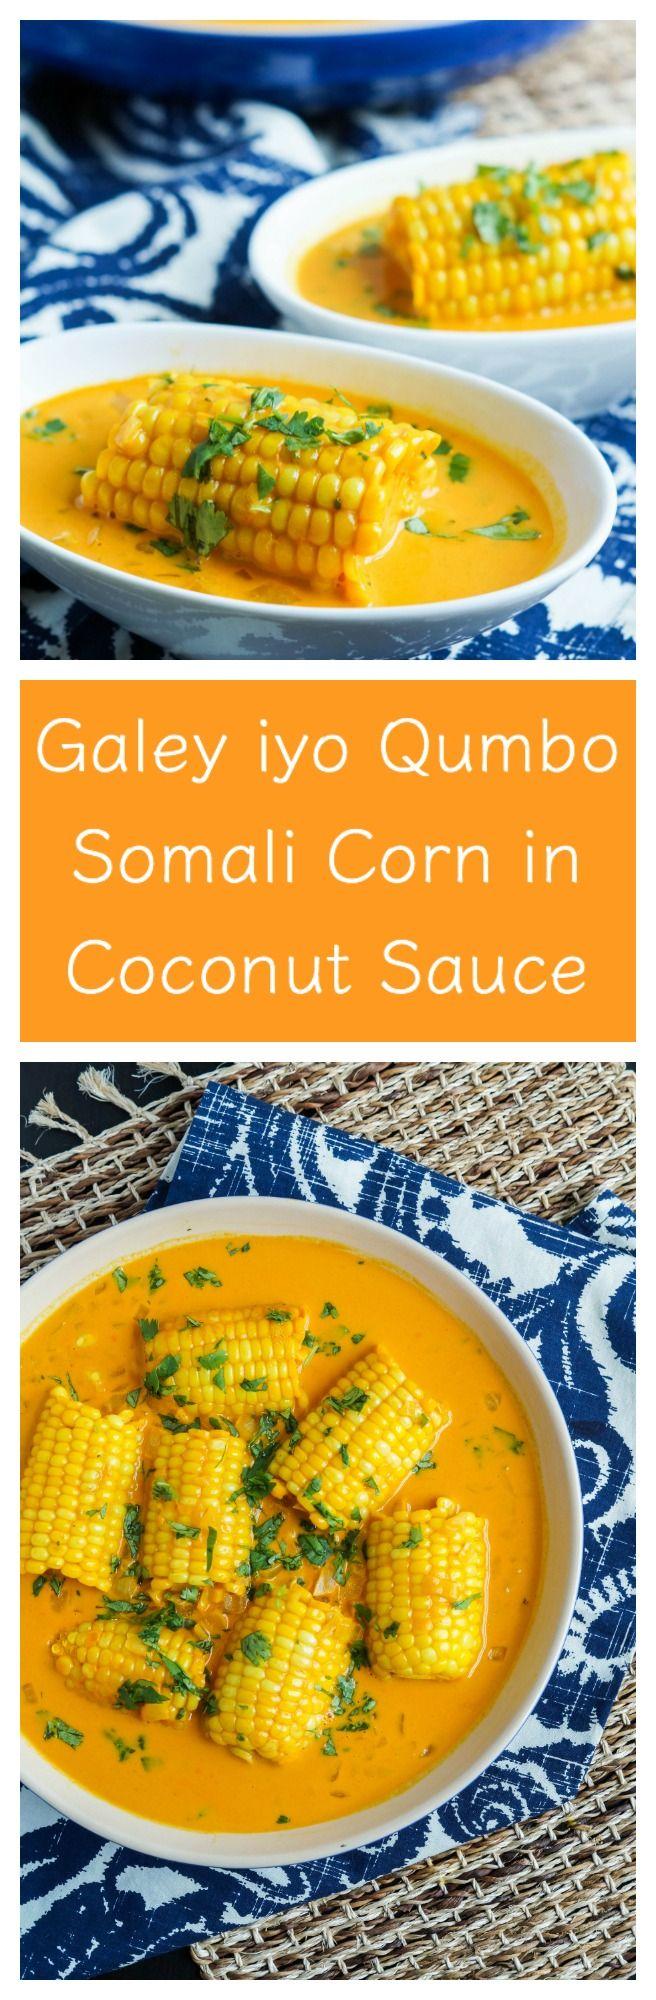 Galey iyo Qumbo- Somali Corn in Coconut Sauce for #SundaySupper  #corn…